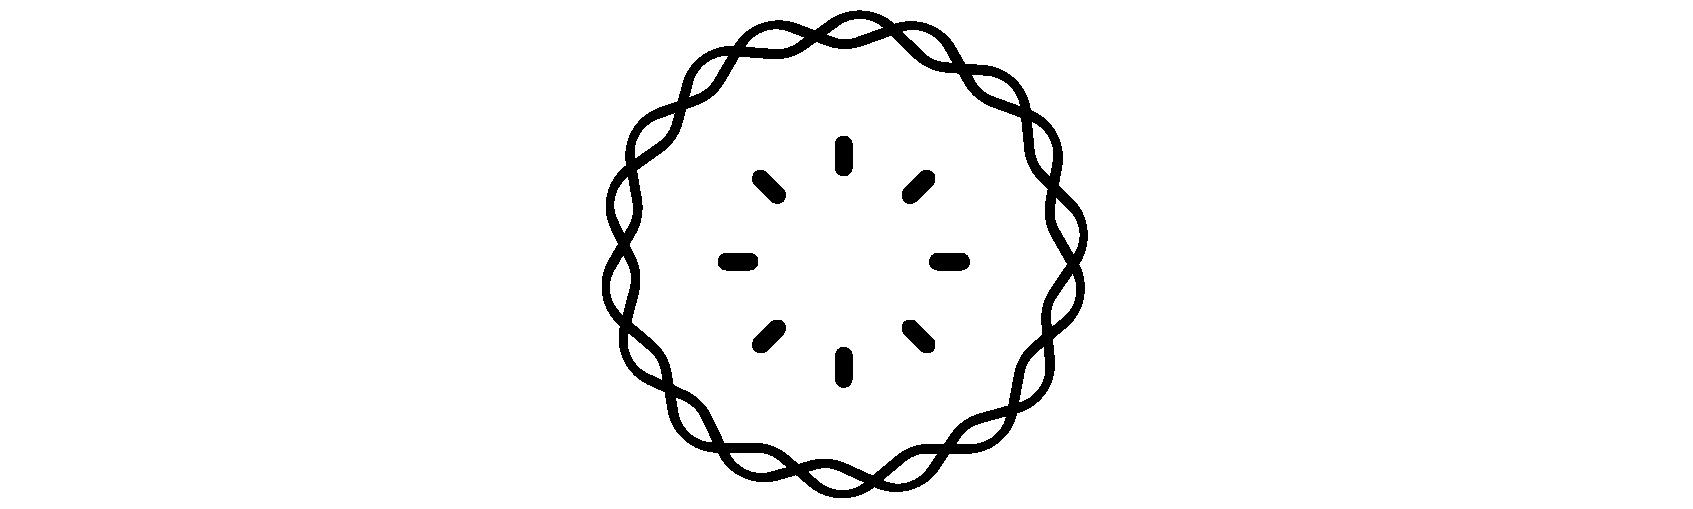 RAW-Membership-Icons-13.png